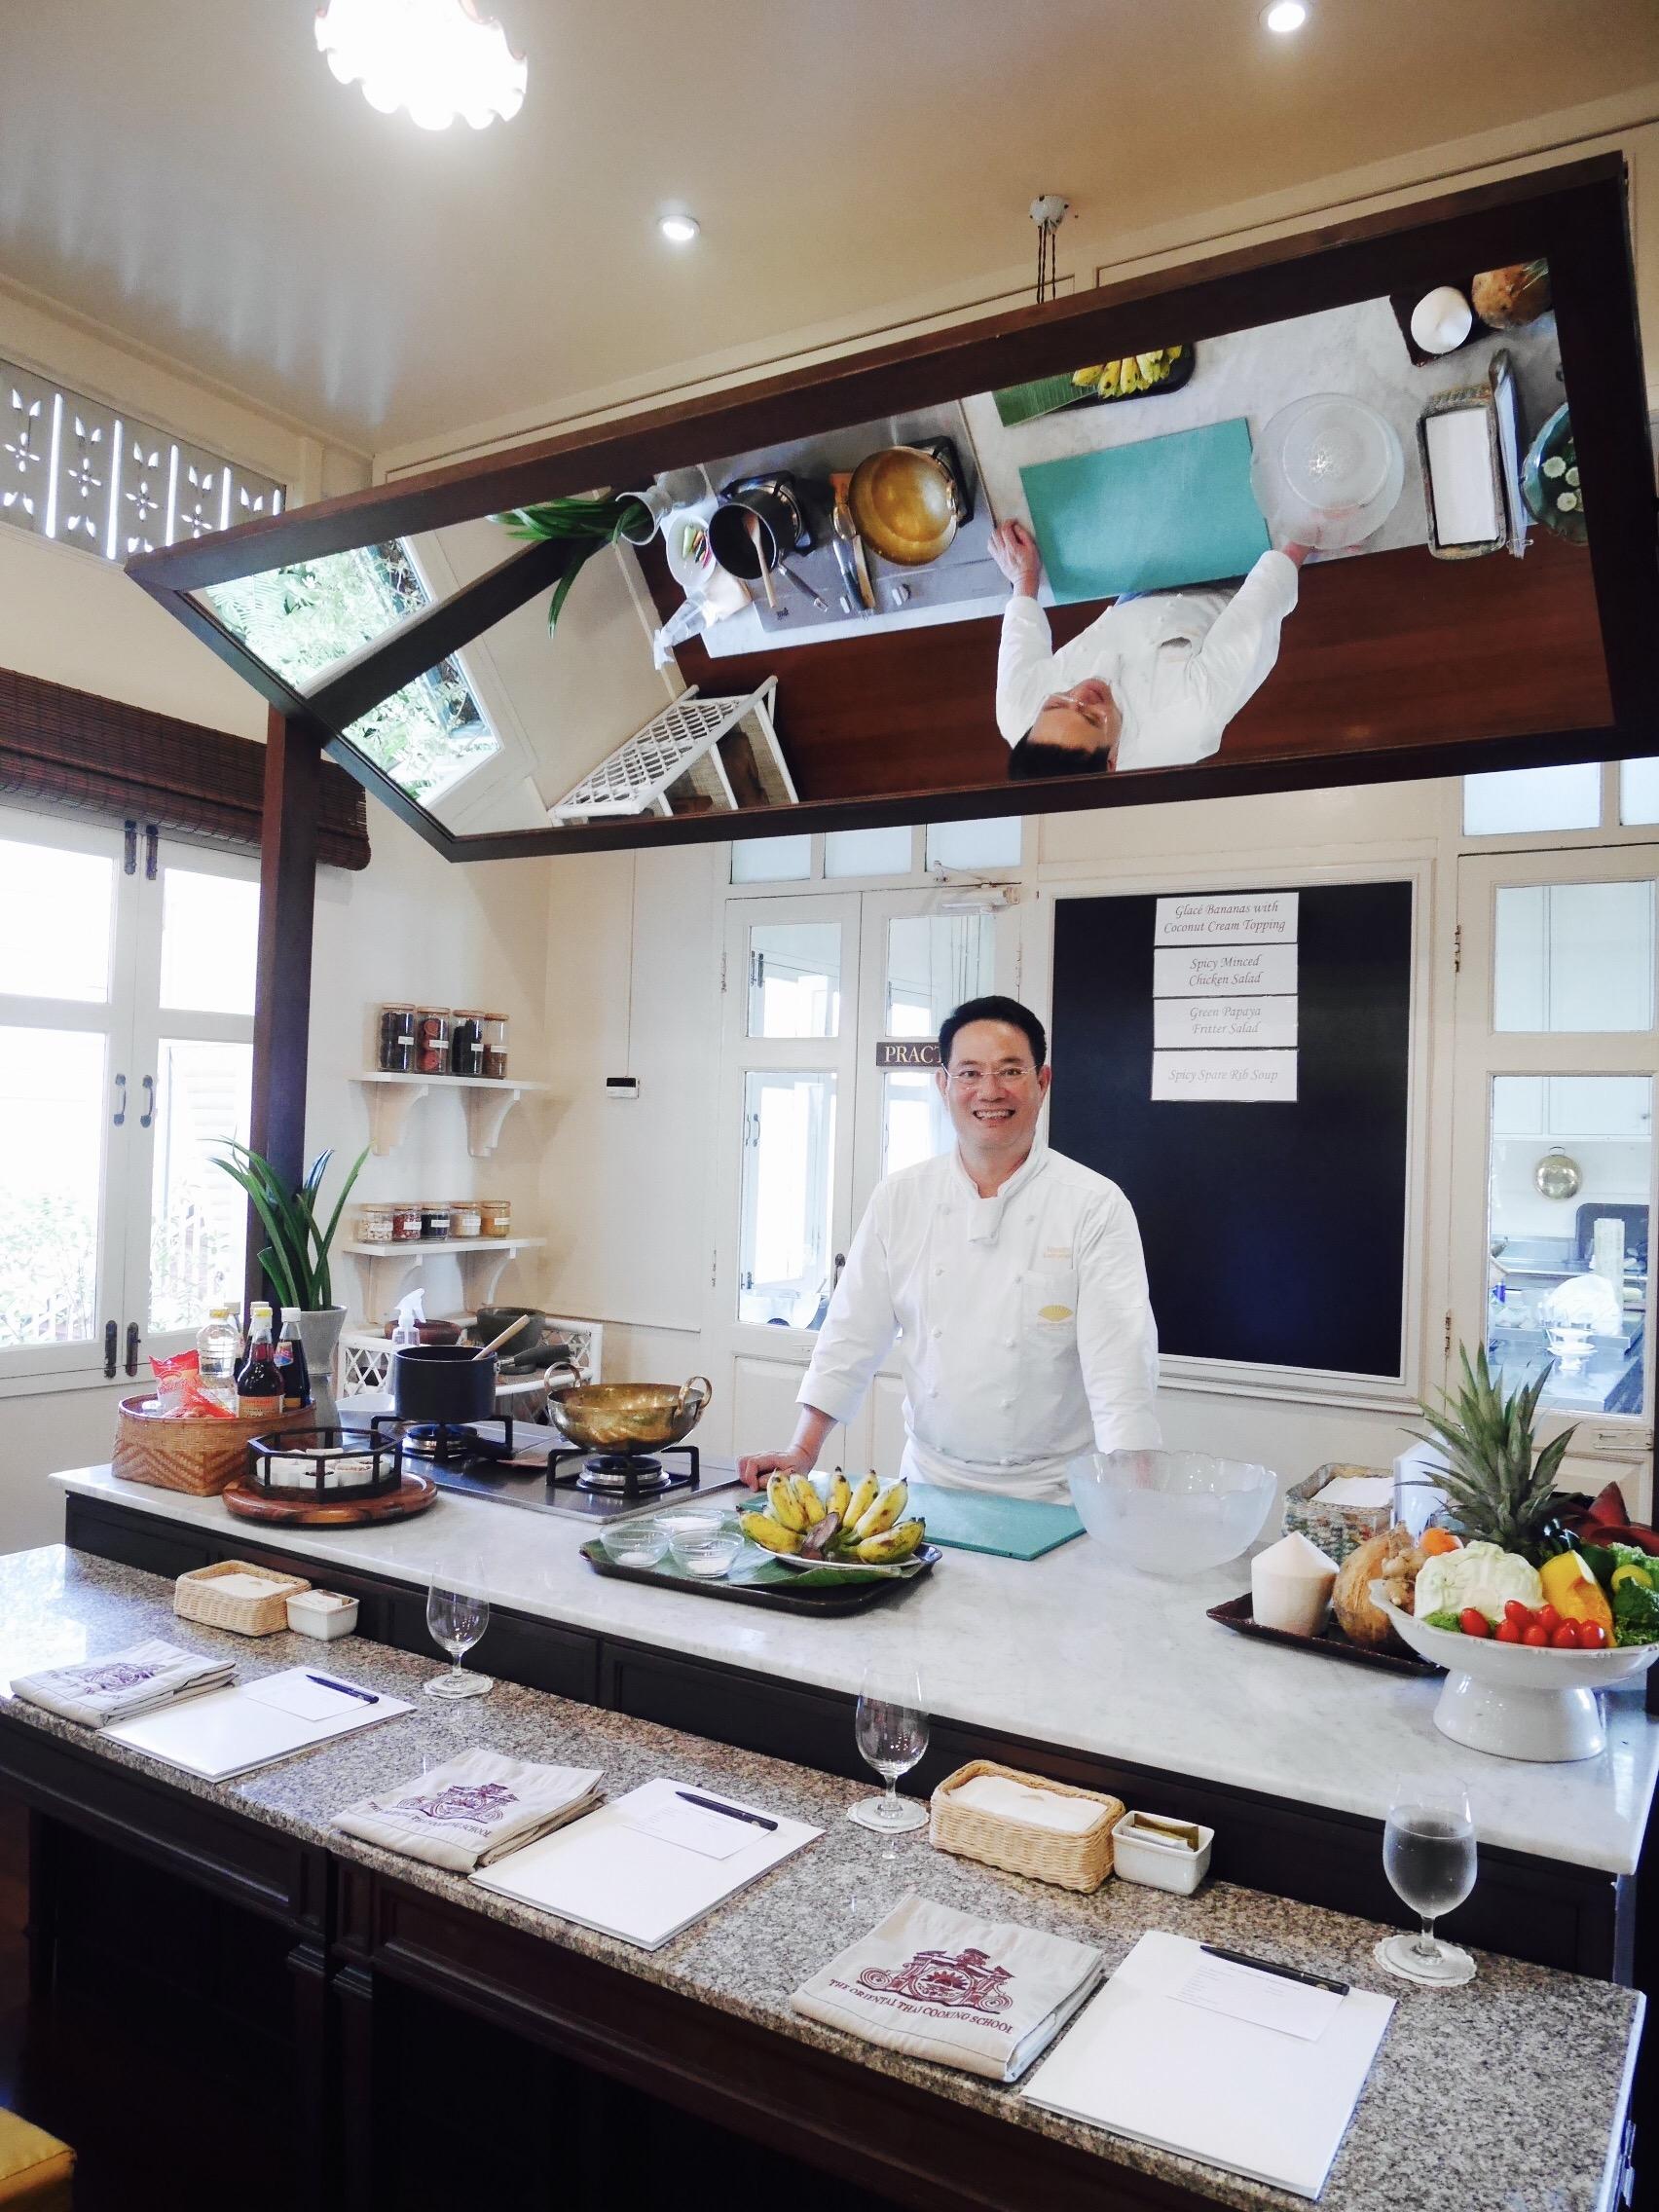 img 9104 1 - The Oriental Thai Cooking School - マンダリンオリエンタルバンコクのおもてなし空間で体験する絶品タイ料理教室